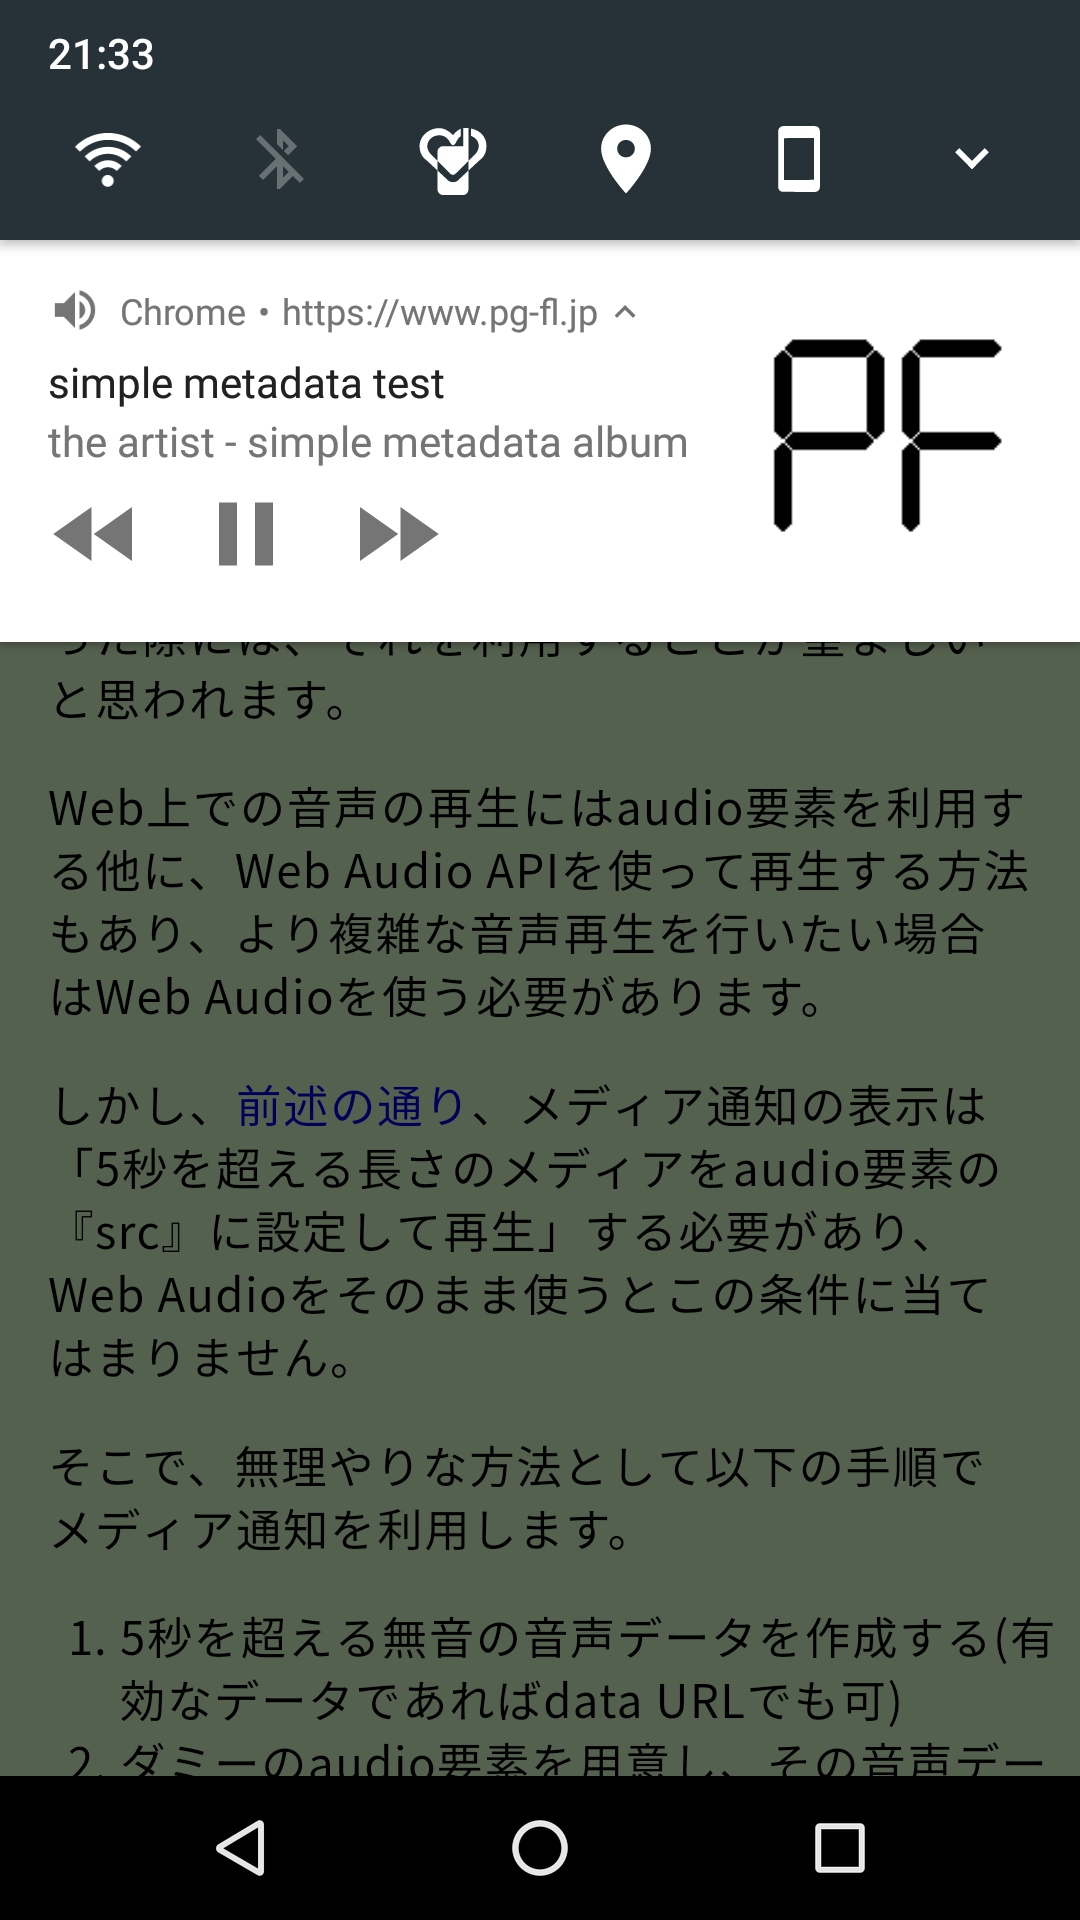 Web] Media Session APIとメディア通知の表示 - Programming Field